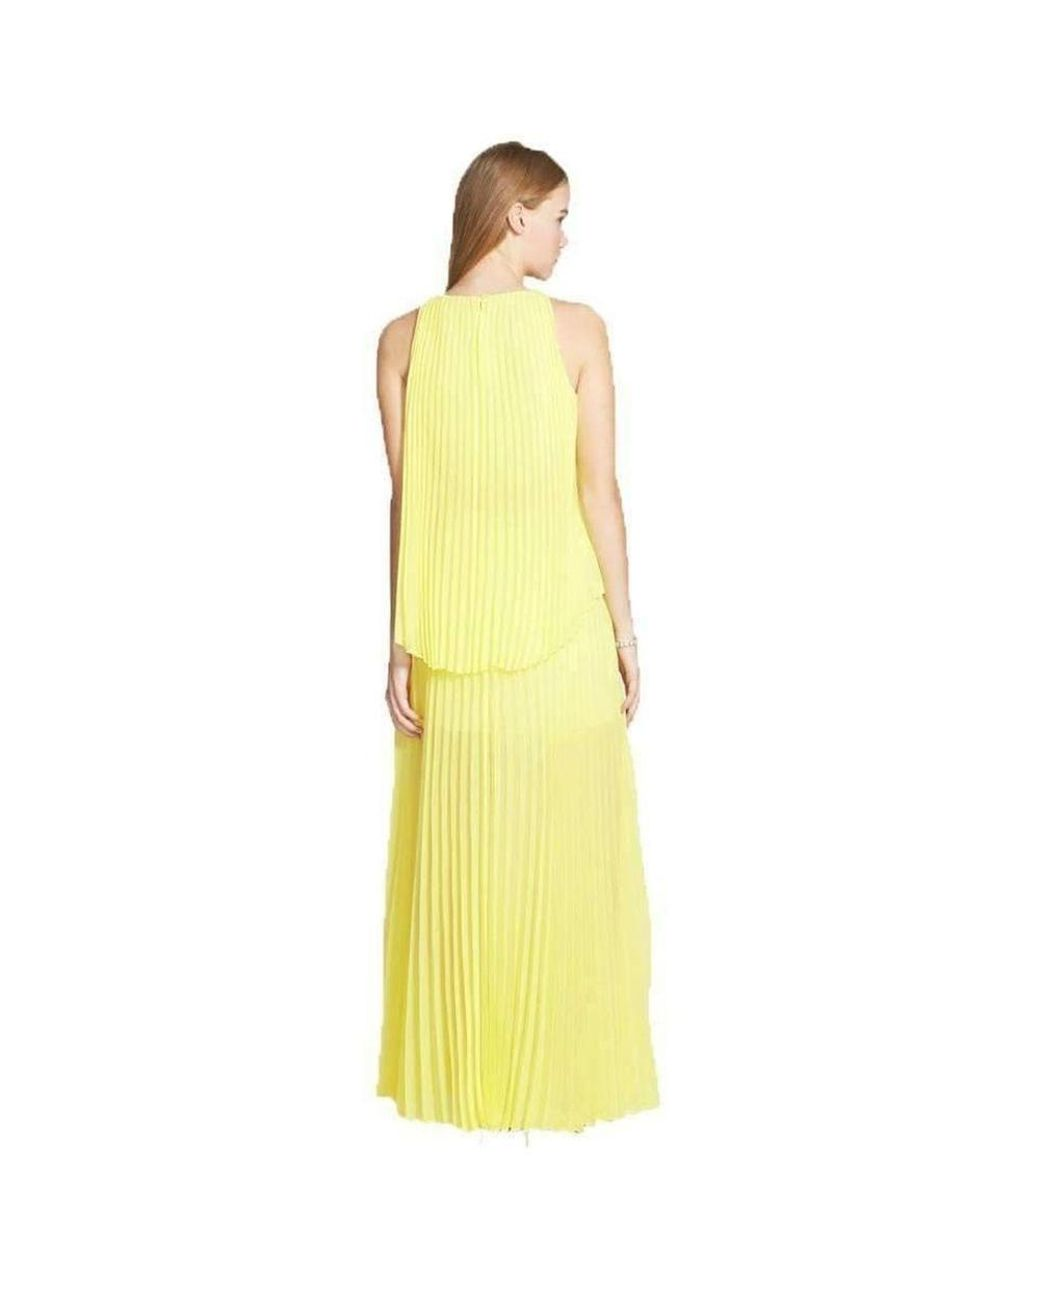 3c536594c4c Lyst - BCBGMAXAZRIA Jenine Neon High Split Pleated Skirt Maxi Dress in  Yellow